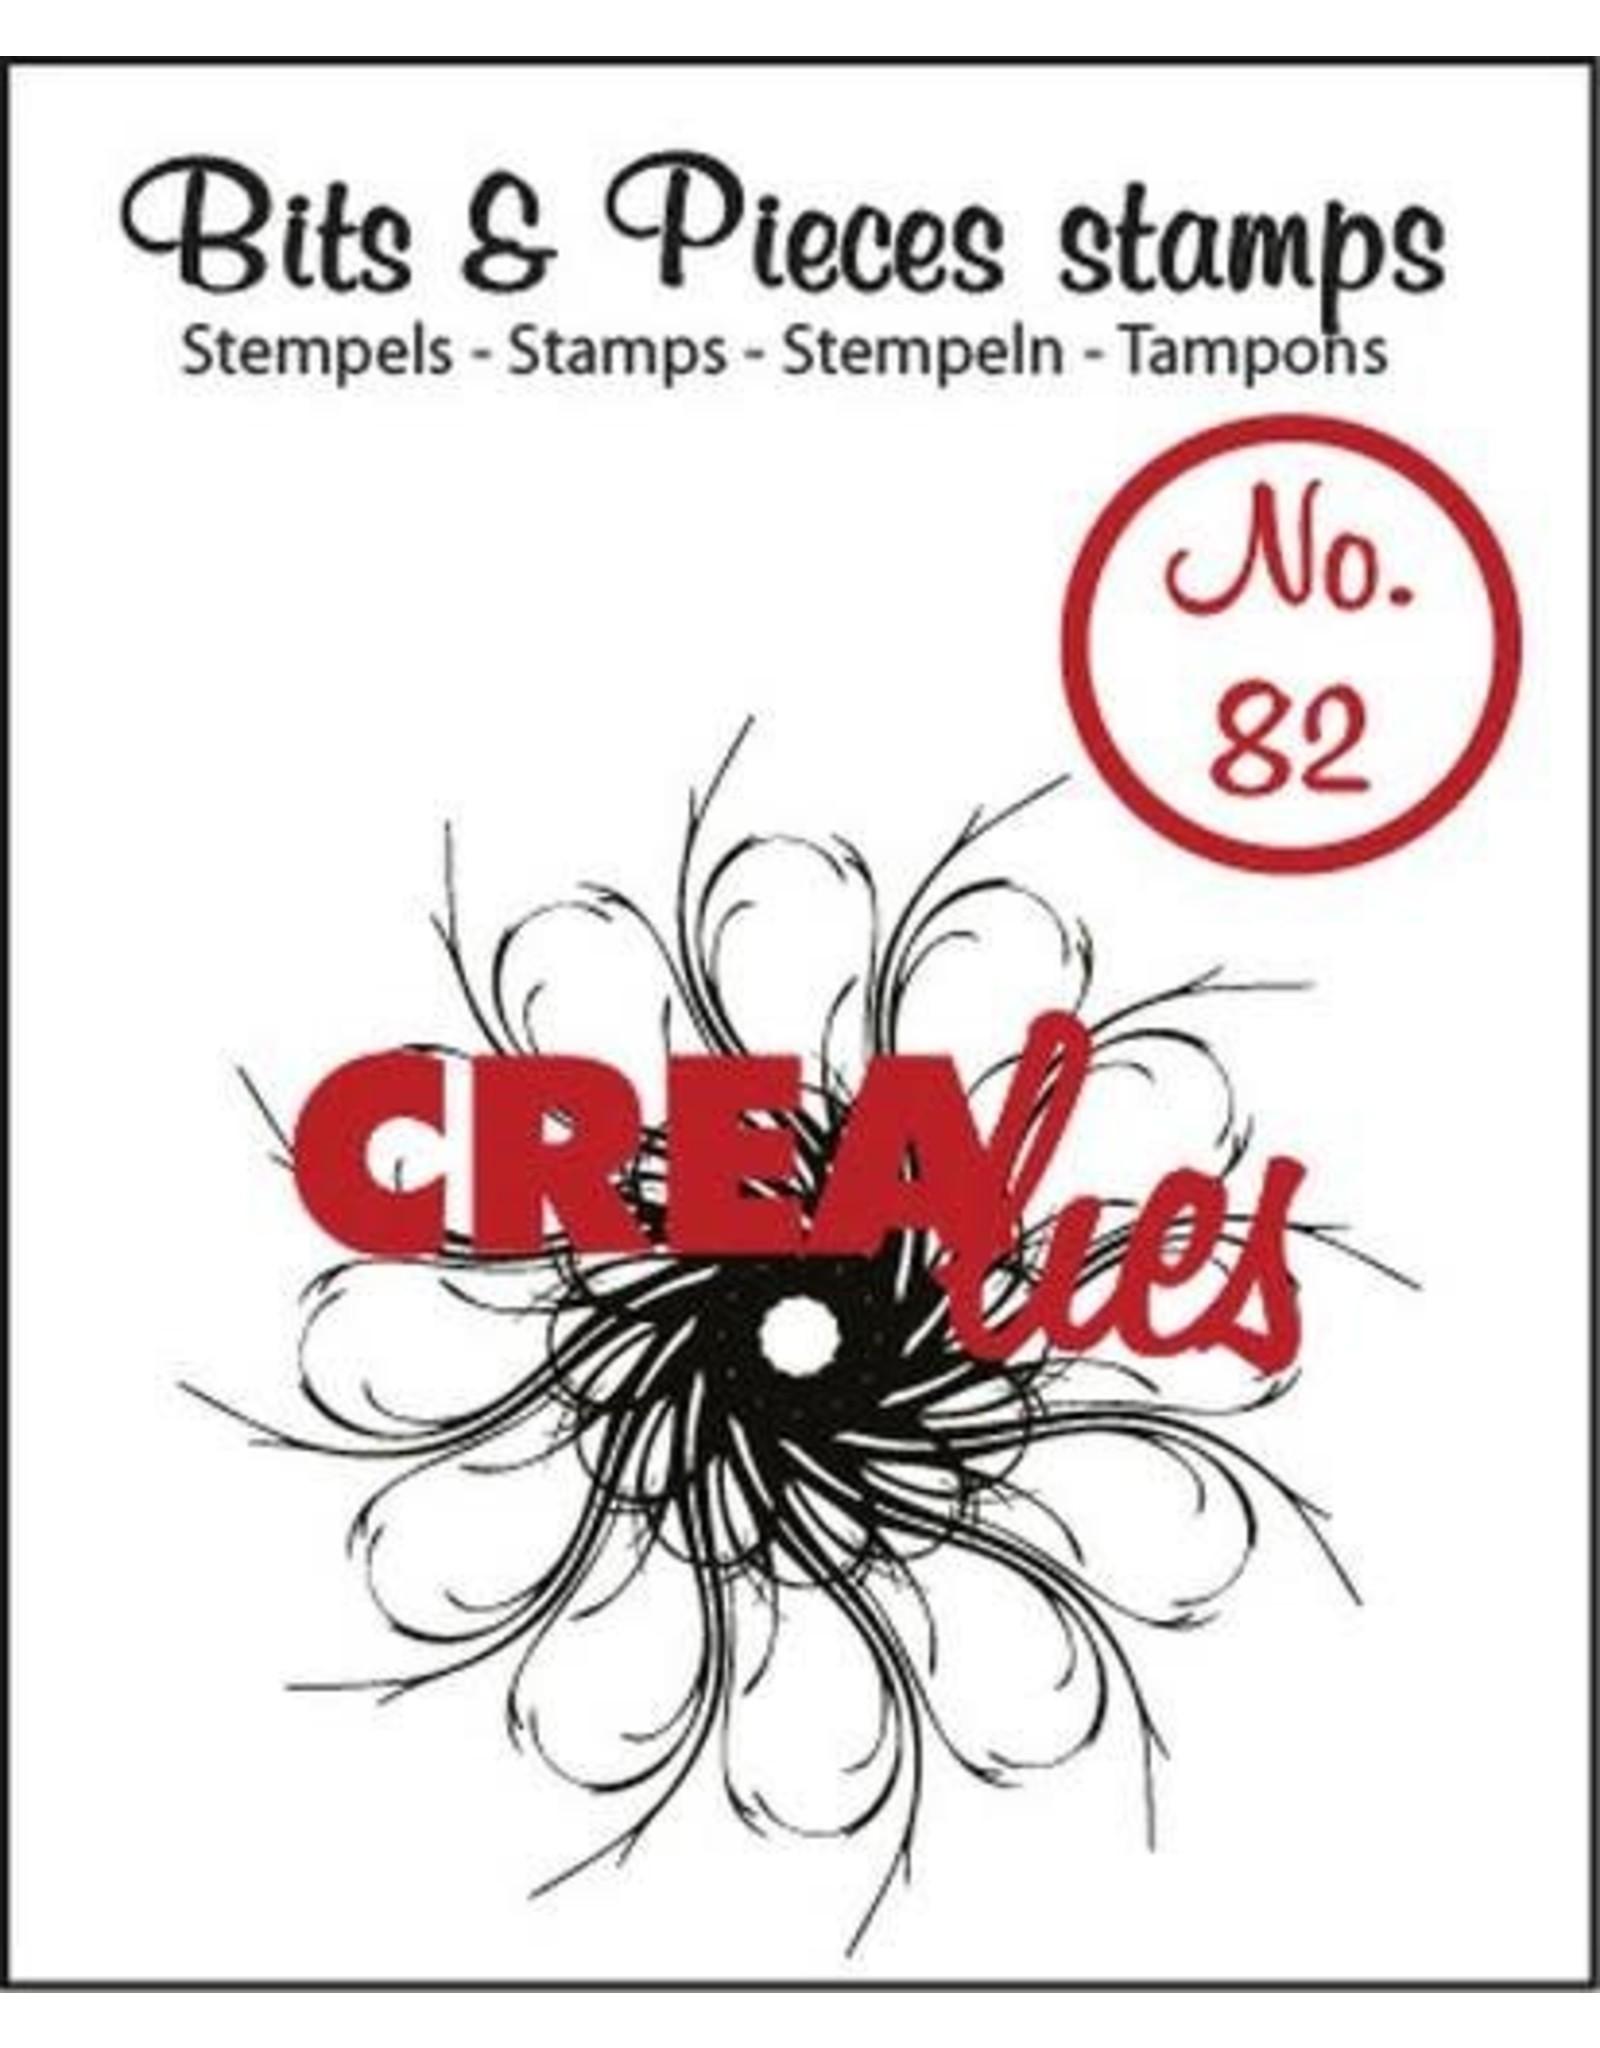 Crealies Crealies Clearstamp Bits&Pieces no. 82 Circle of swirls